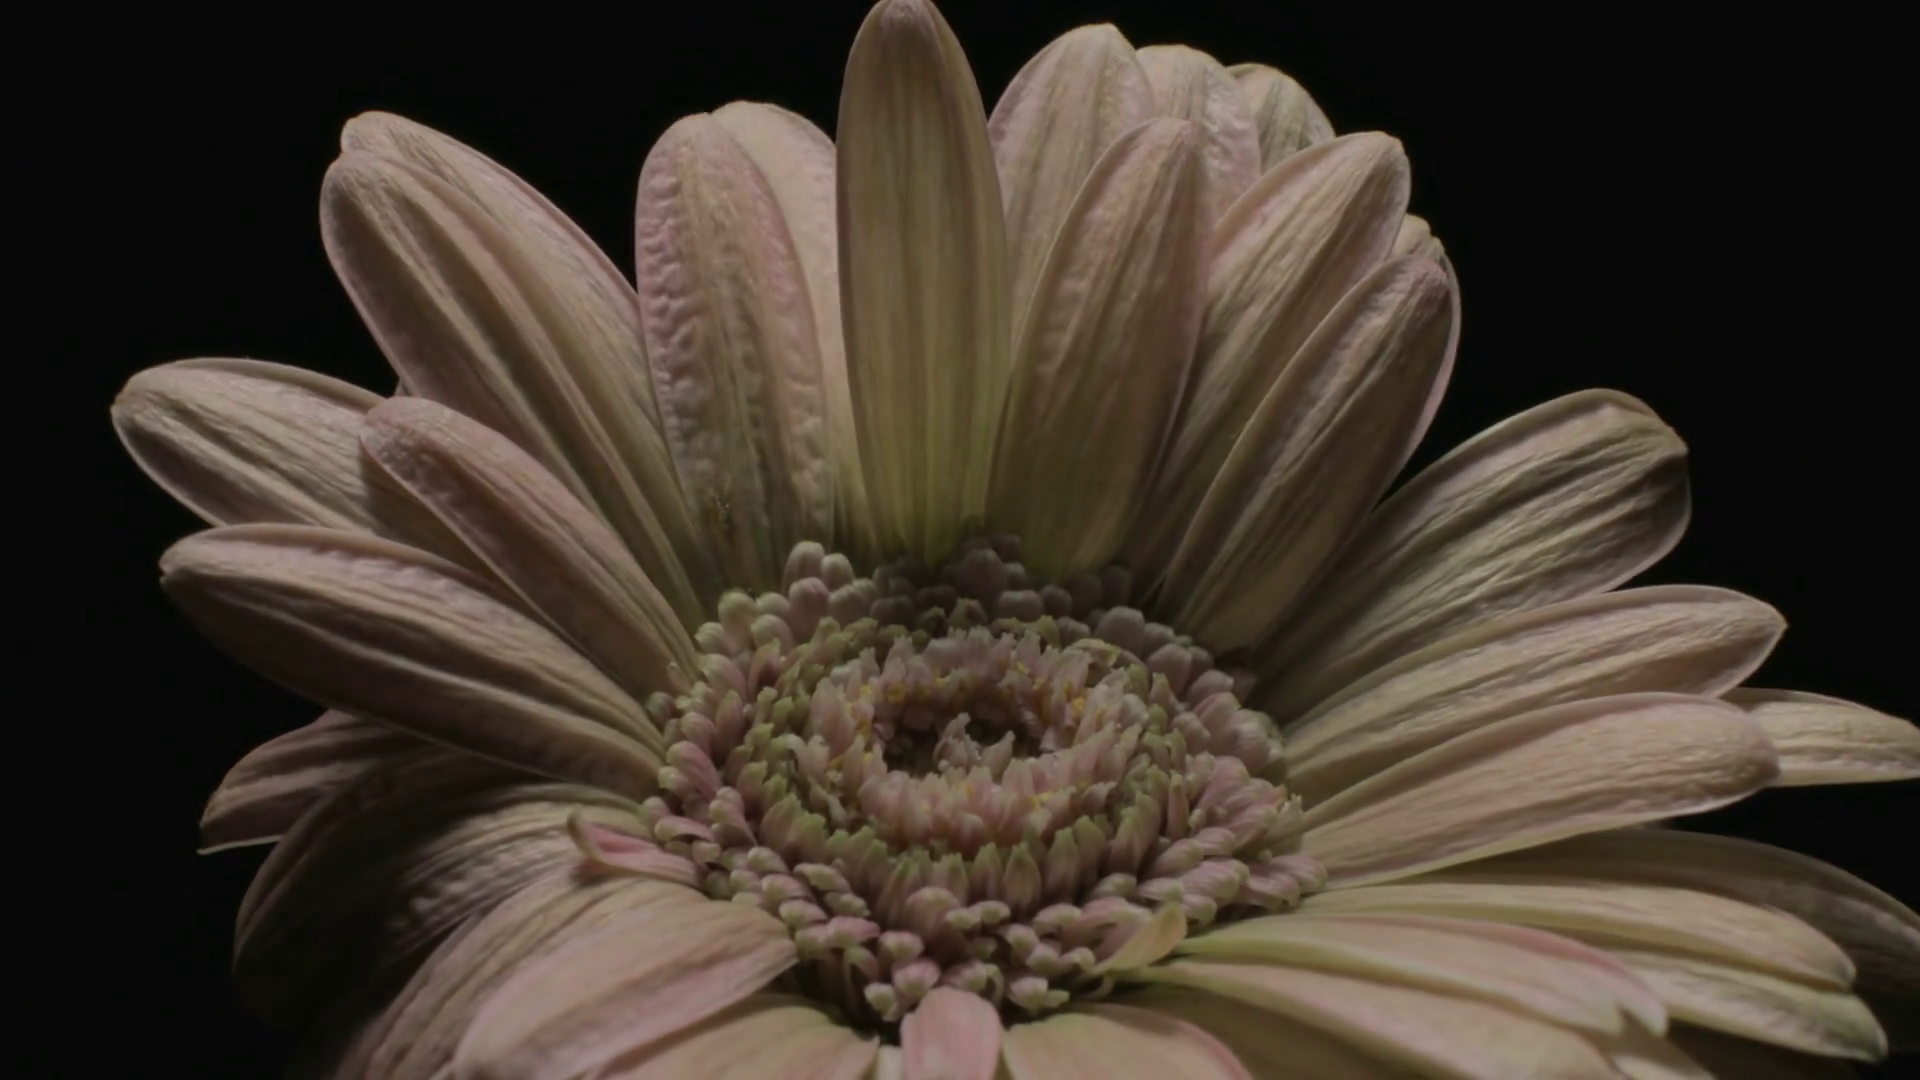 Medium close up motion time lapse shot of a pink Gerbera daisy ...